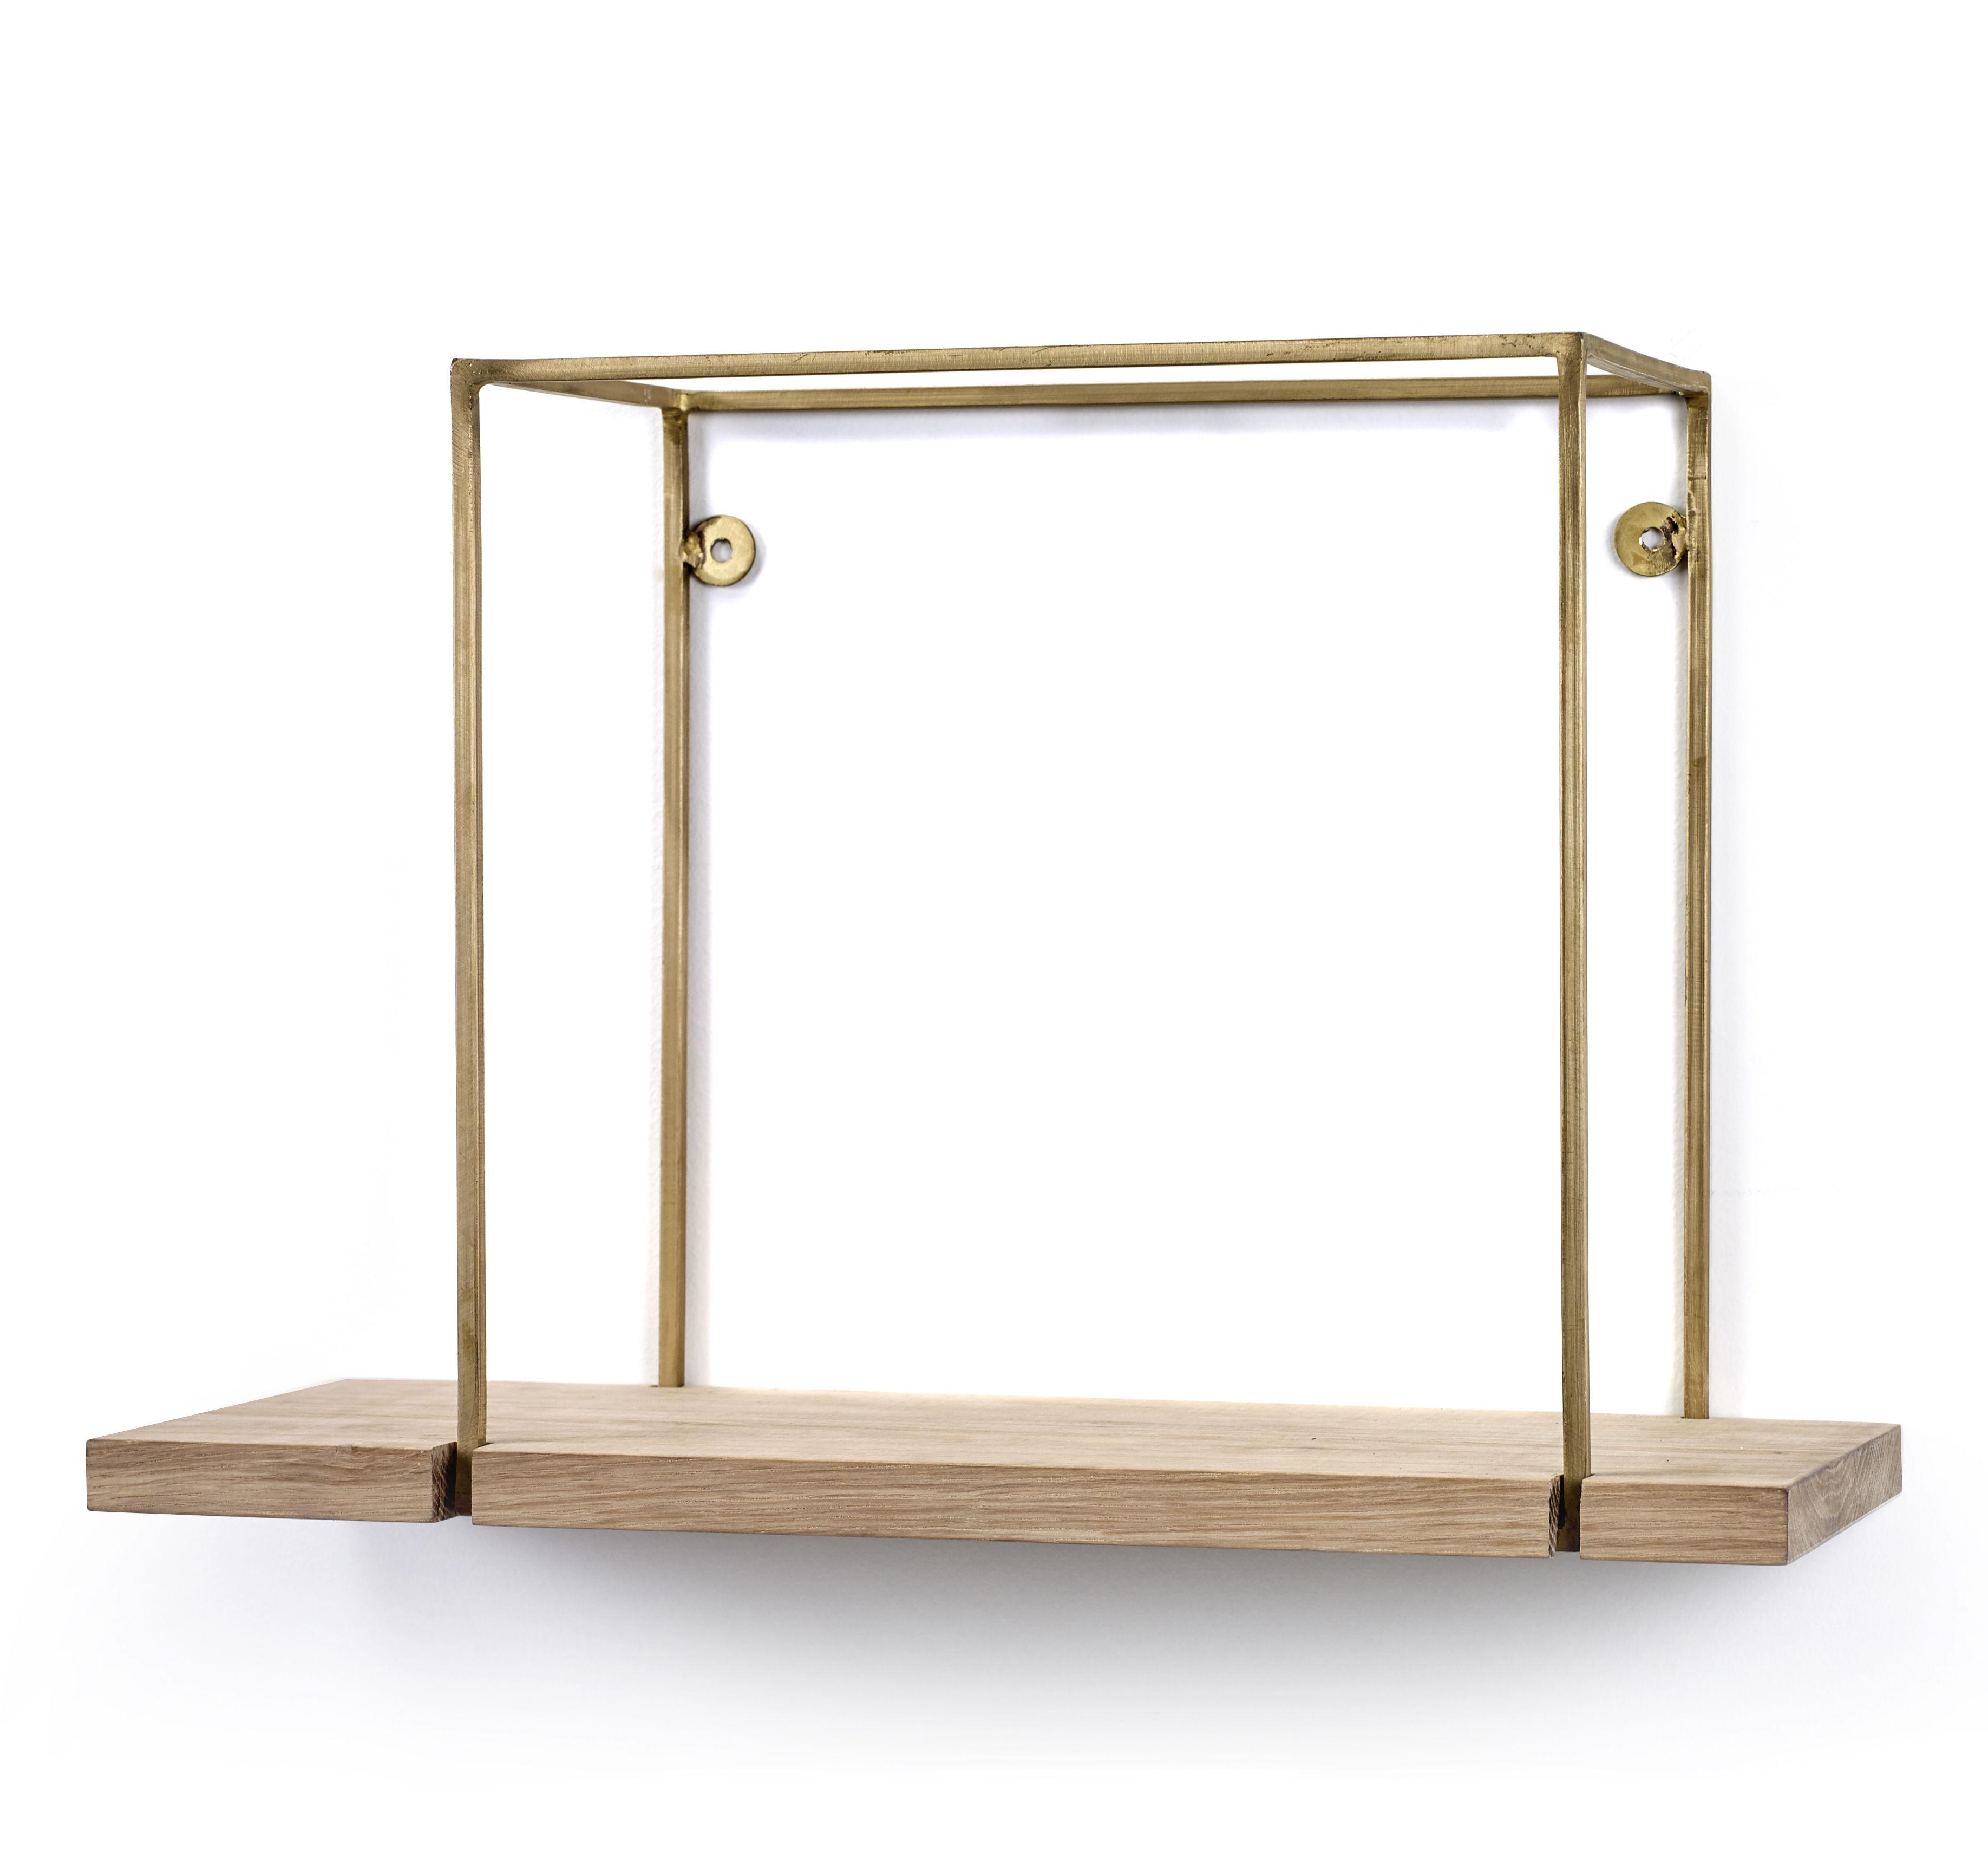 etag re hang rack small l 45 x h 30 cm h 30 cm bois cuivre serax. Black Bedroom Furniture Sets. Home Design Ideas